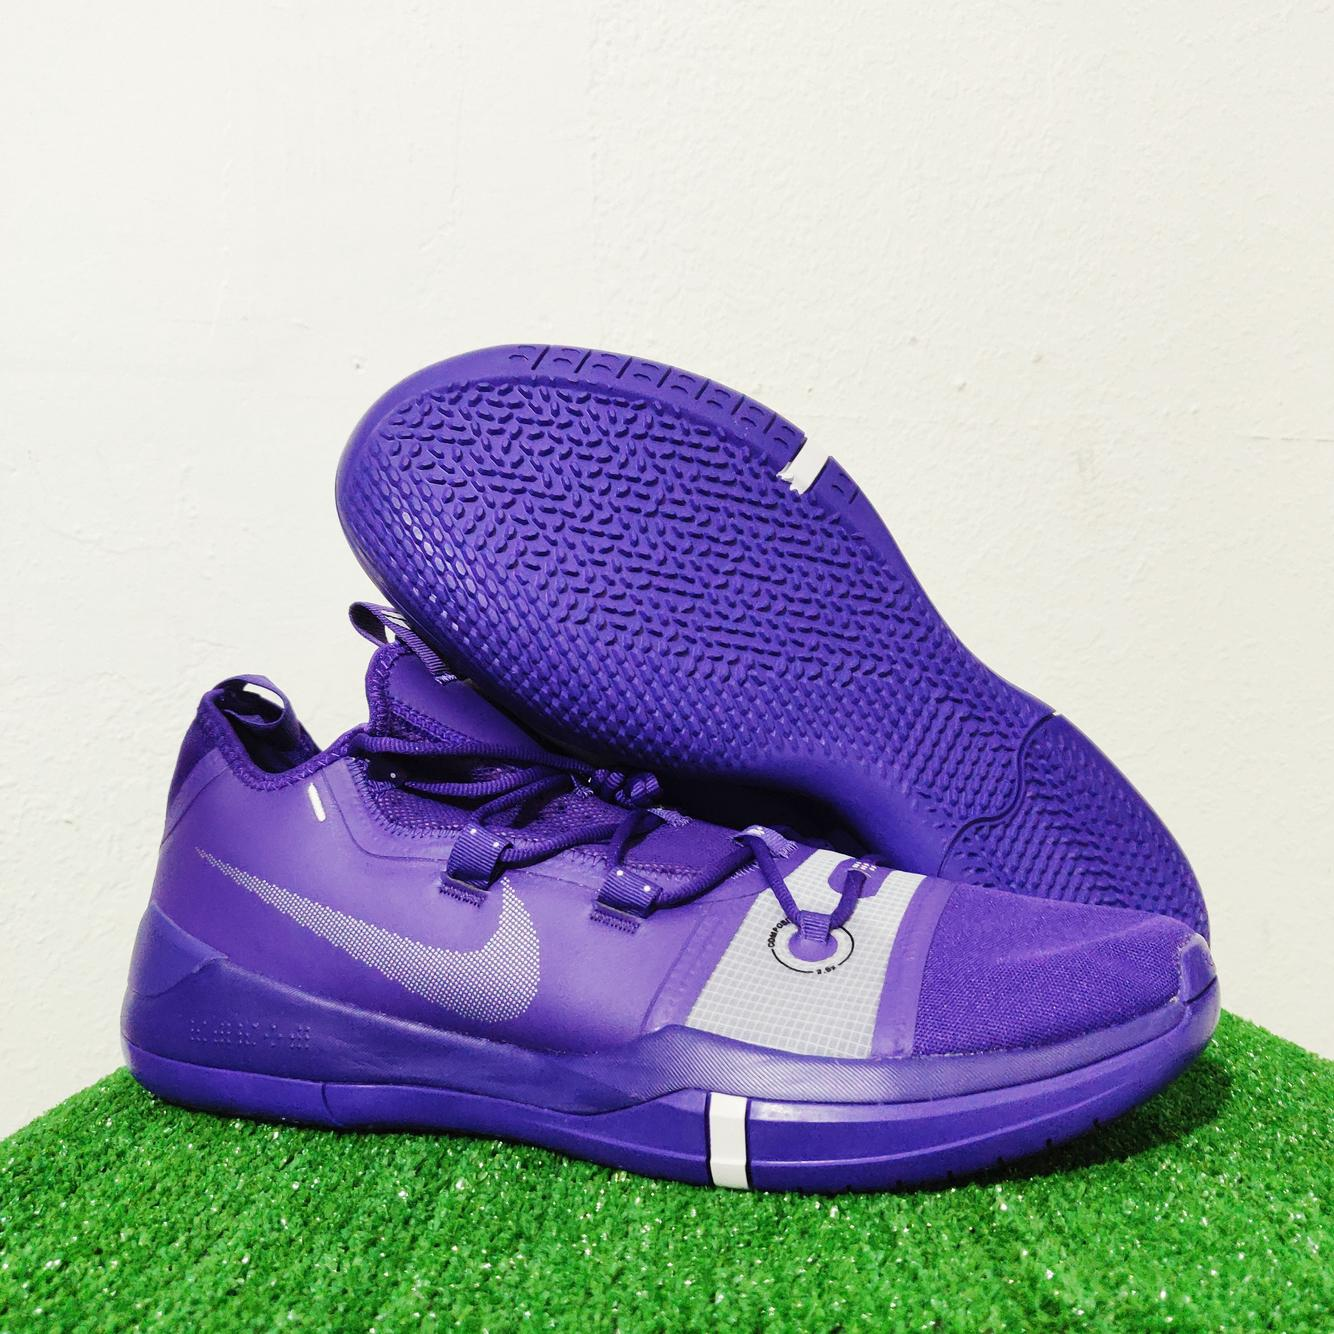 Nike Kobe Bryant AD Exodus TB Purple